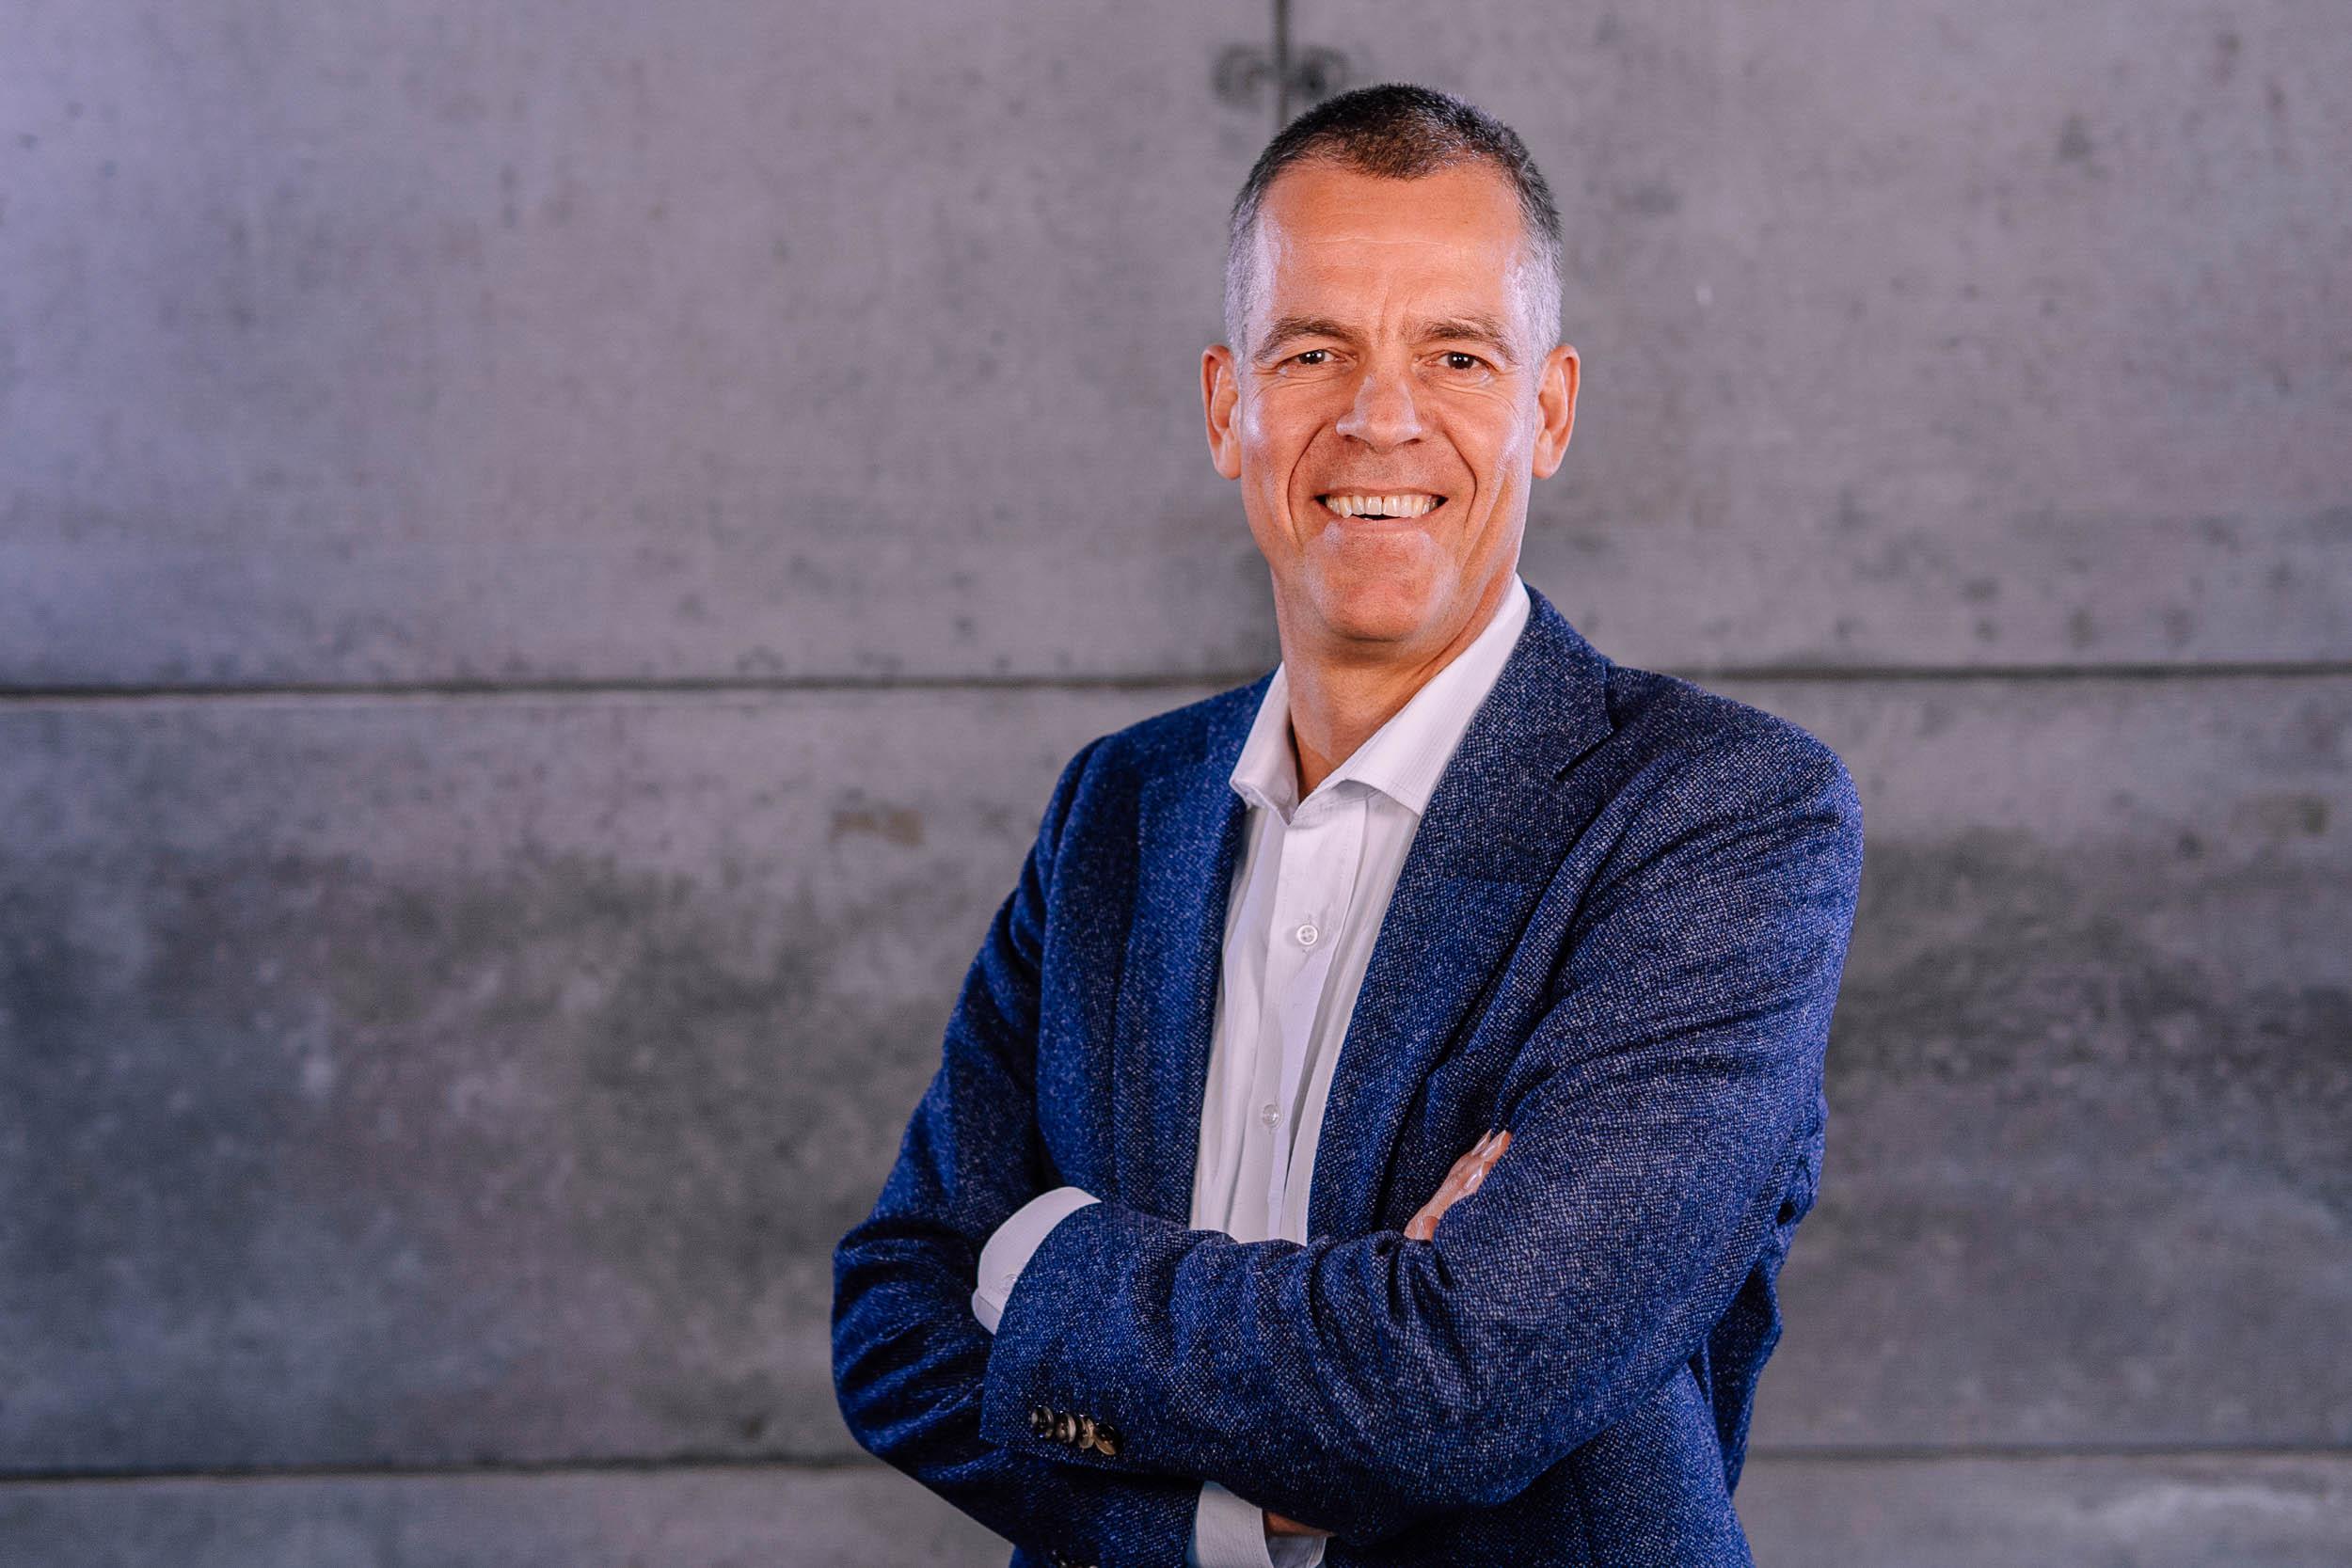 Jens Hartung